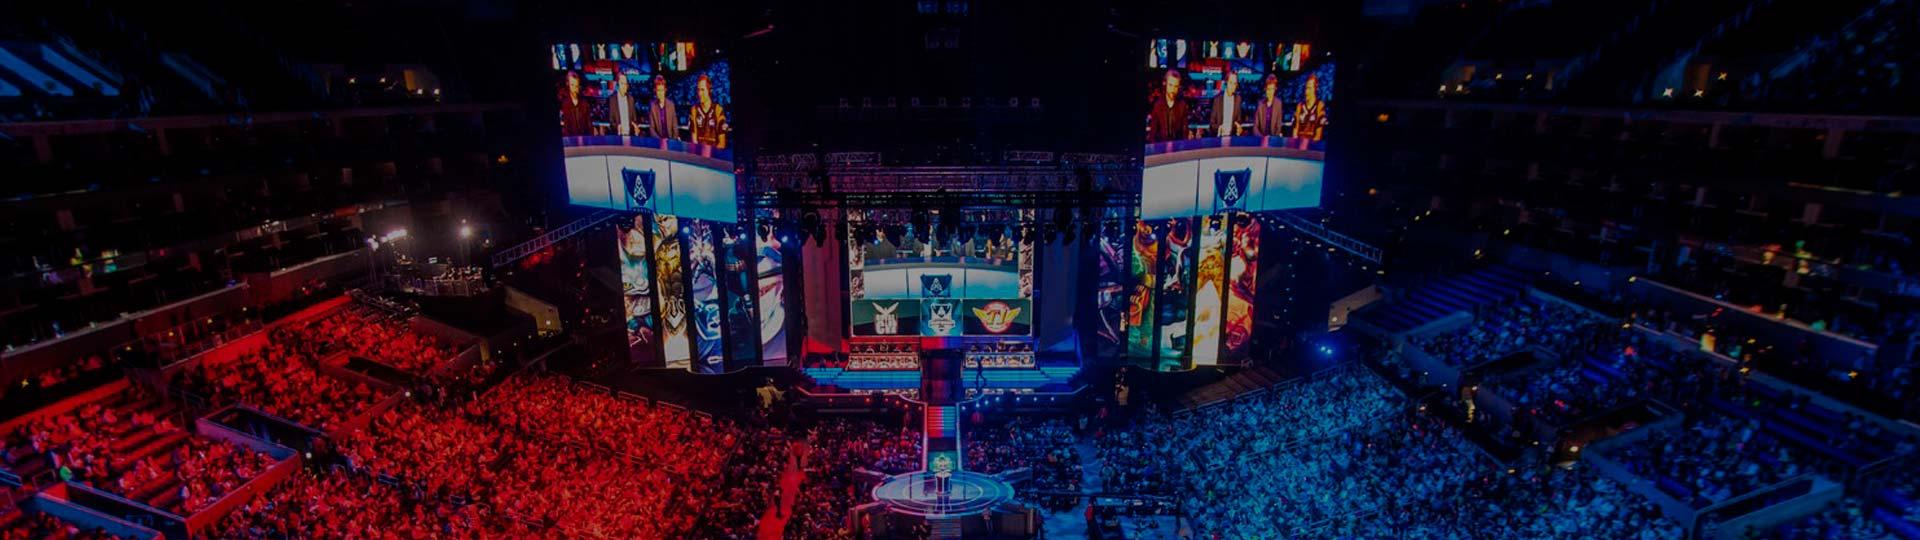 "<img alt=""""  src=""https://www.e-squad.es/wp-content/uploads/2017/09/esports-gamers-torneo-ligas.jpg"" />"